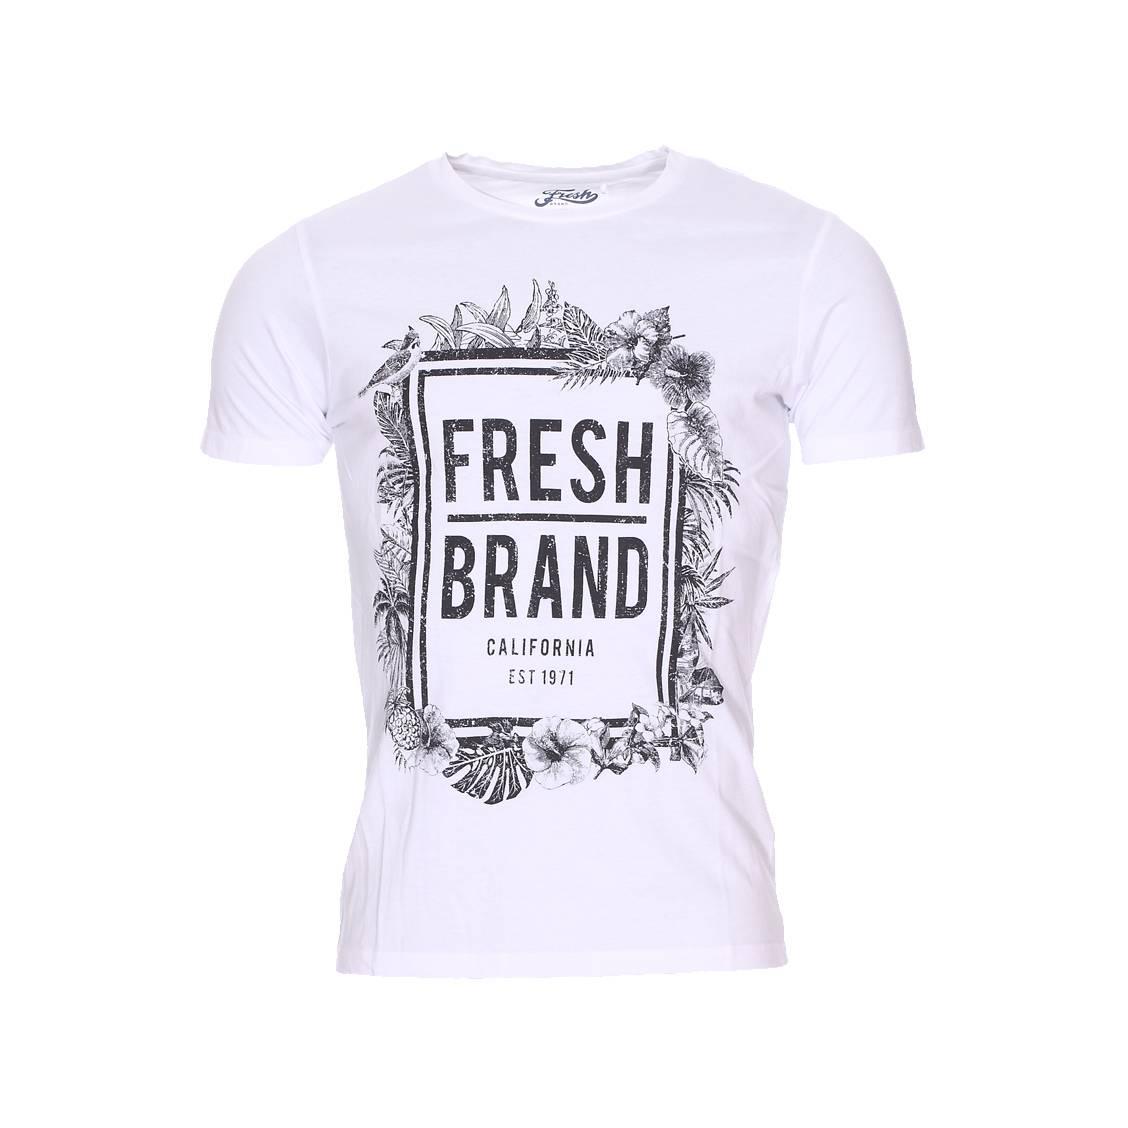 Tee shirt fleuri jusqu 75 pureshopping for Fresh brand t shirts